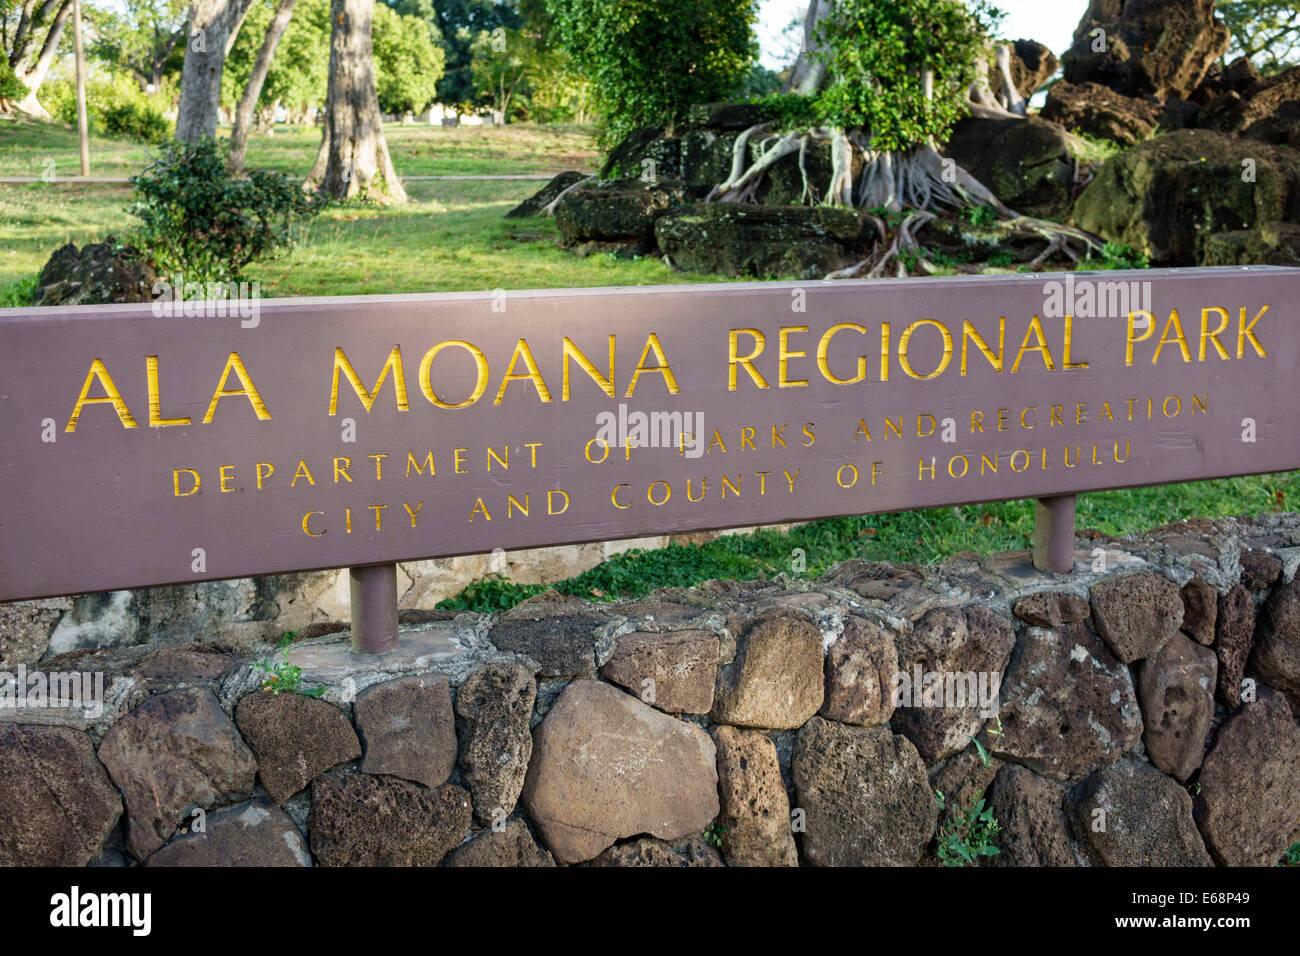 Hawaii Hawaiian Honolulu Ala Moana Beach State Regional Park sign Stock Photo